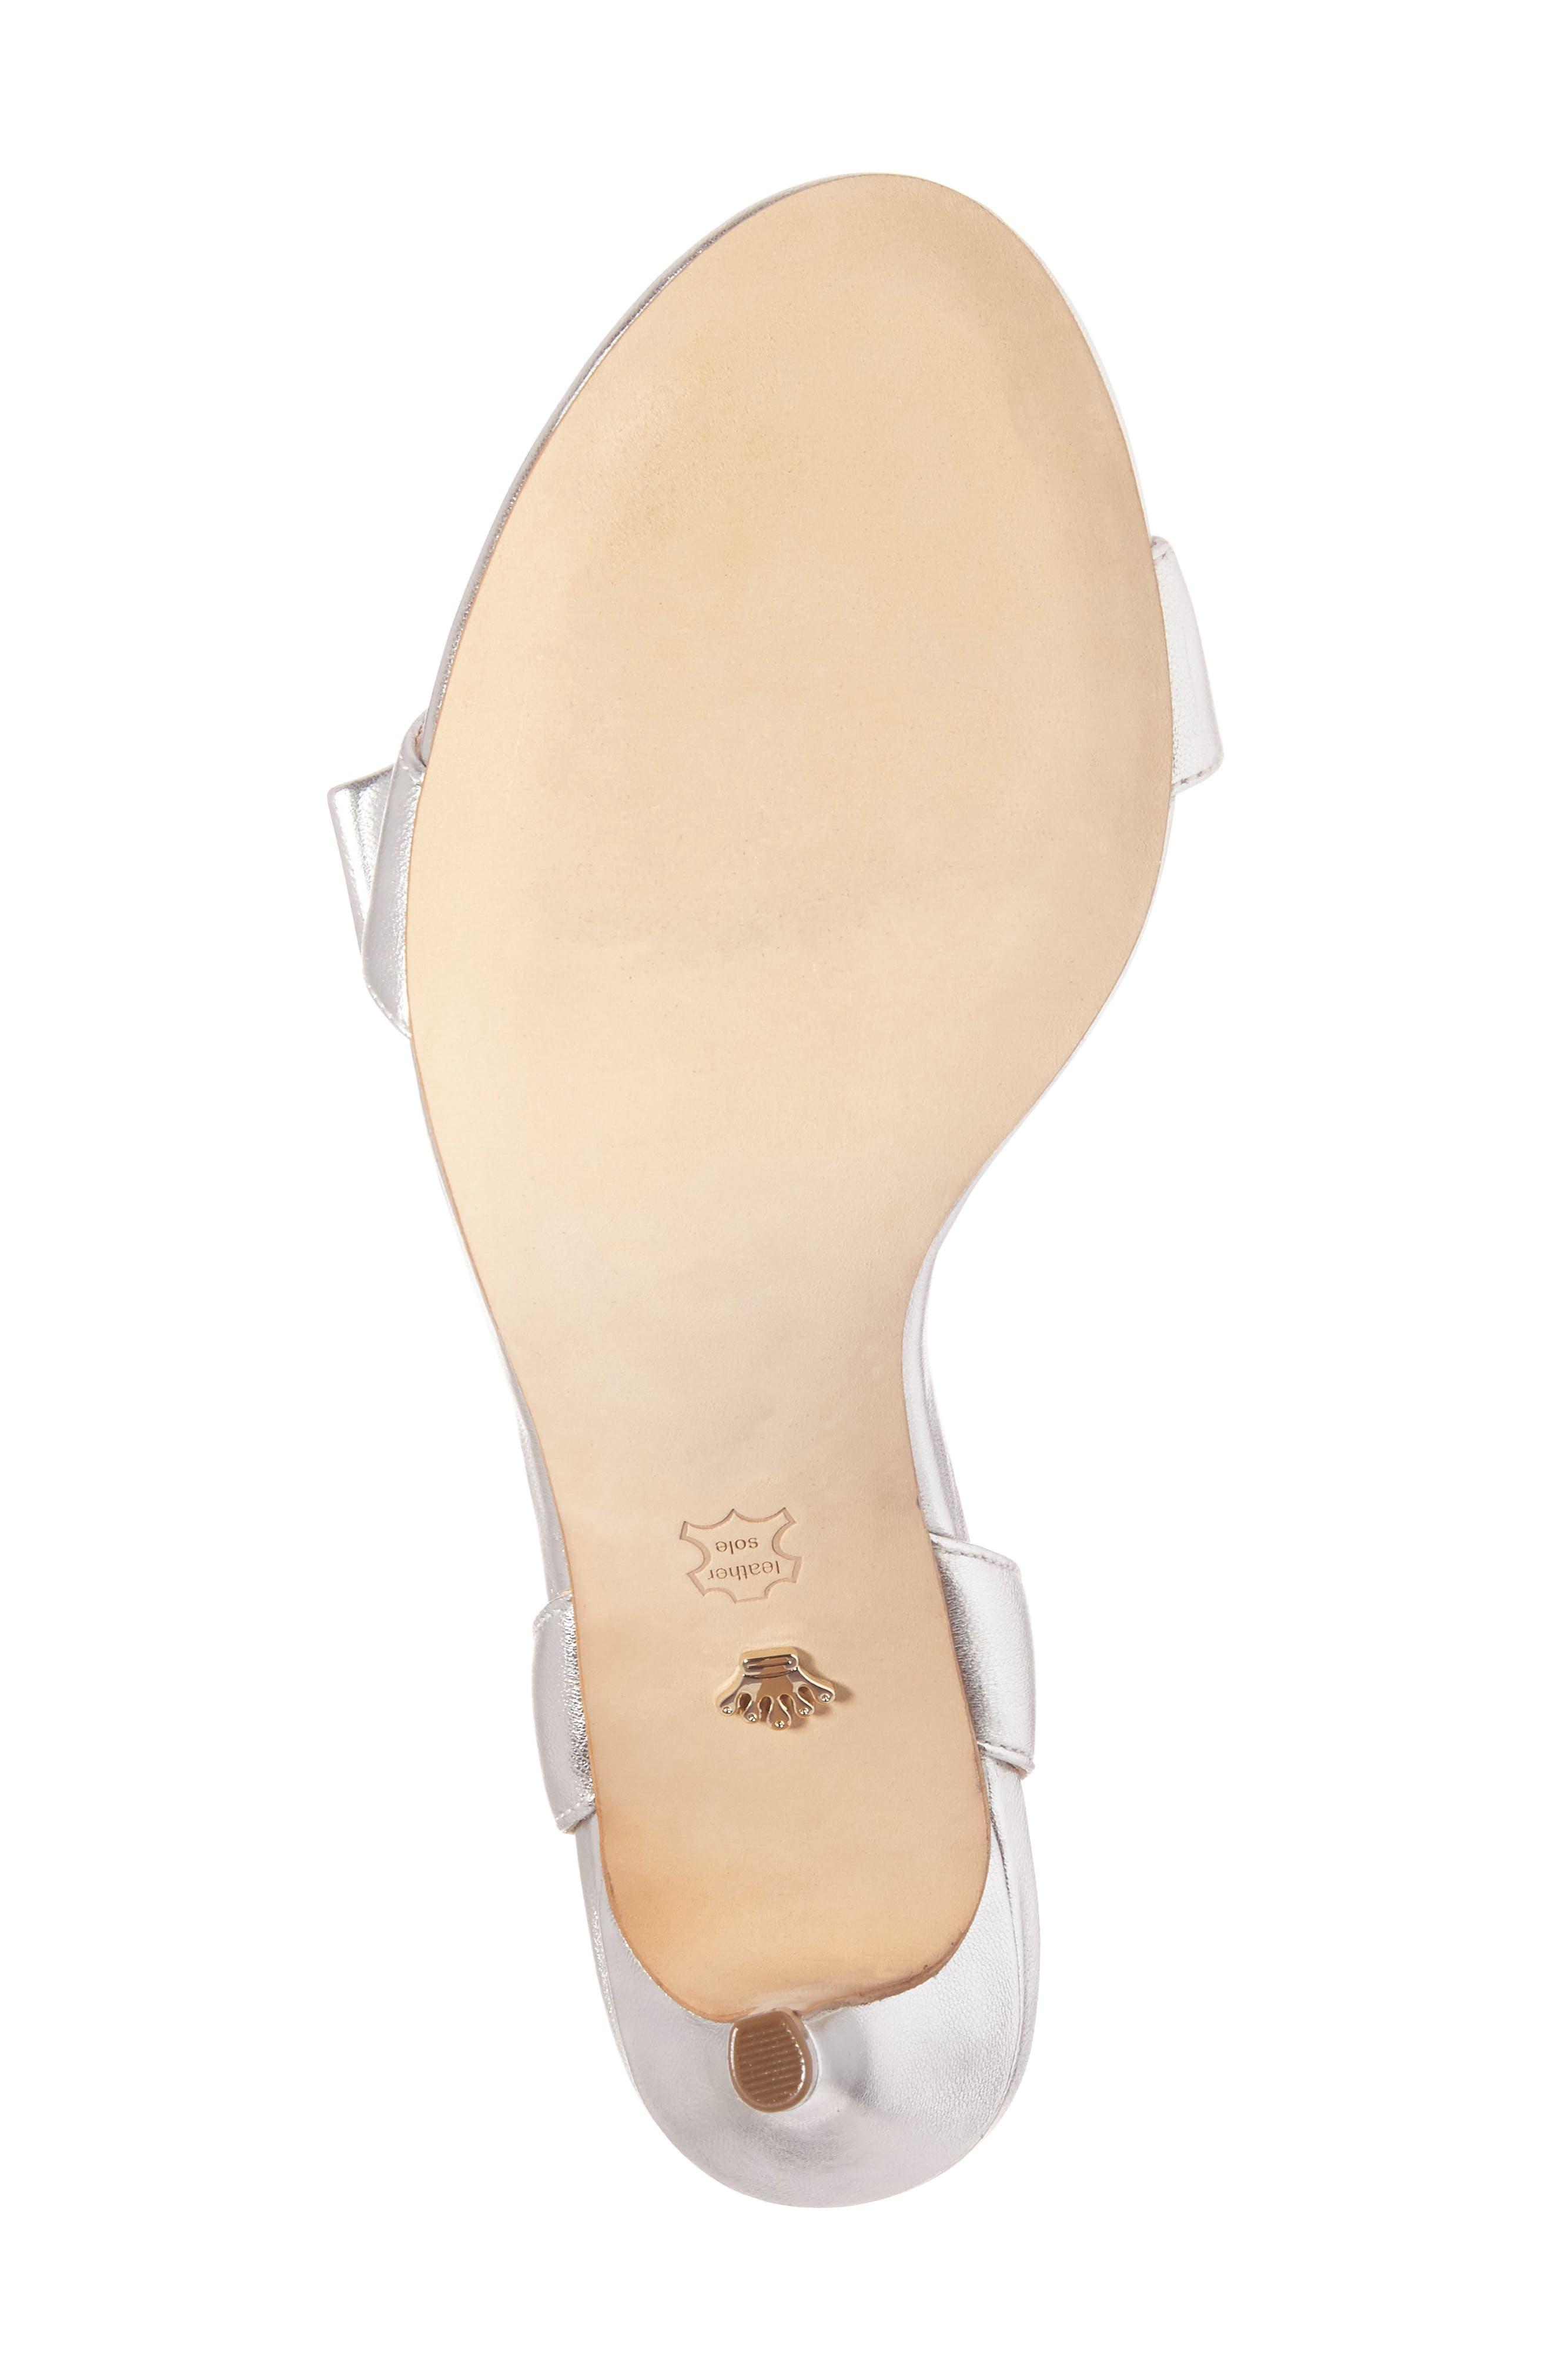 Kabira Swarovski Embellished Strappy Sandal,                             Alternate thumbnail 4, color,                             SILVER LEATHER